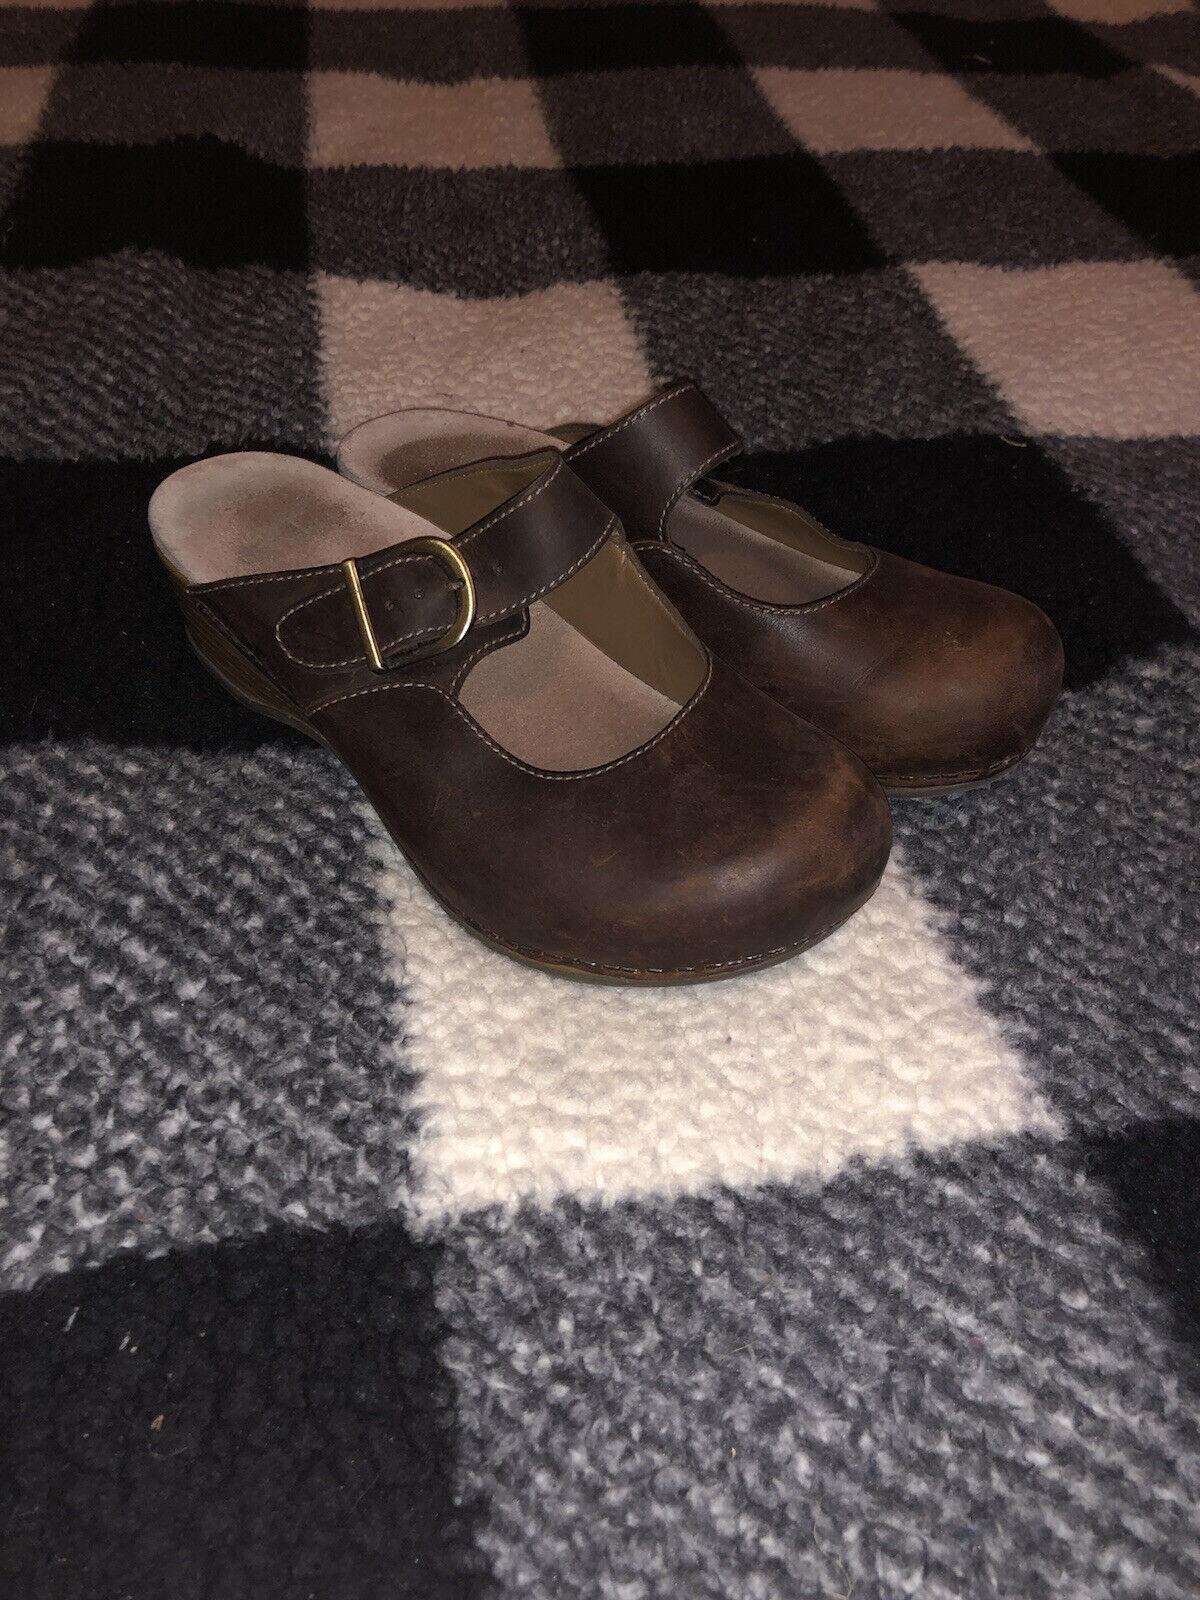 Dansko Britney Brown Clogs Waxy Burnished Leather Women's -- Size EU 38